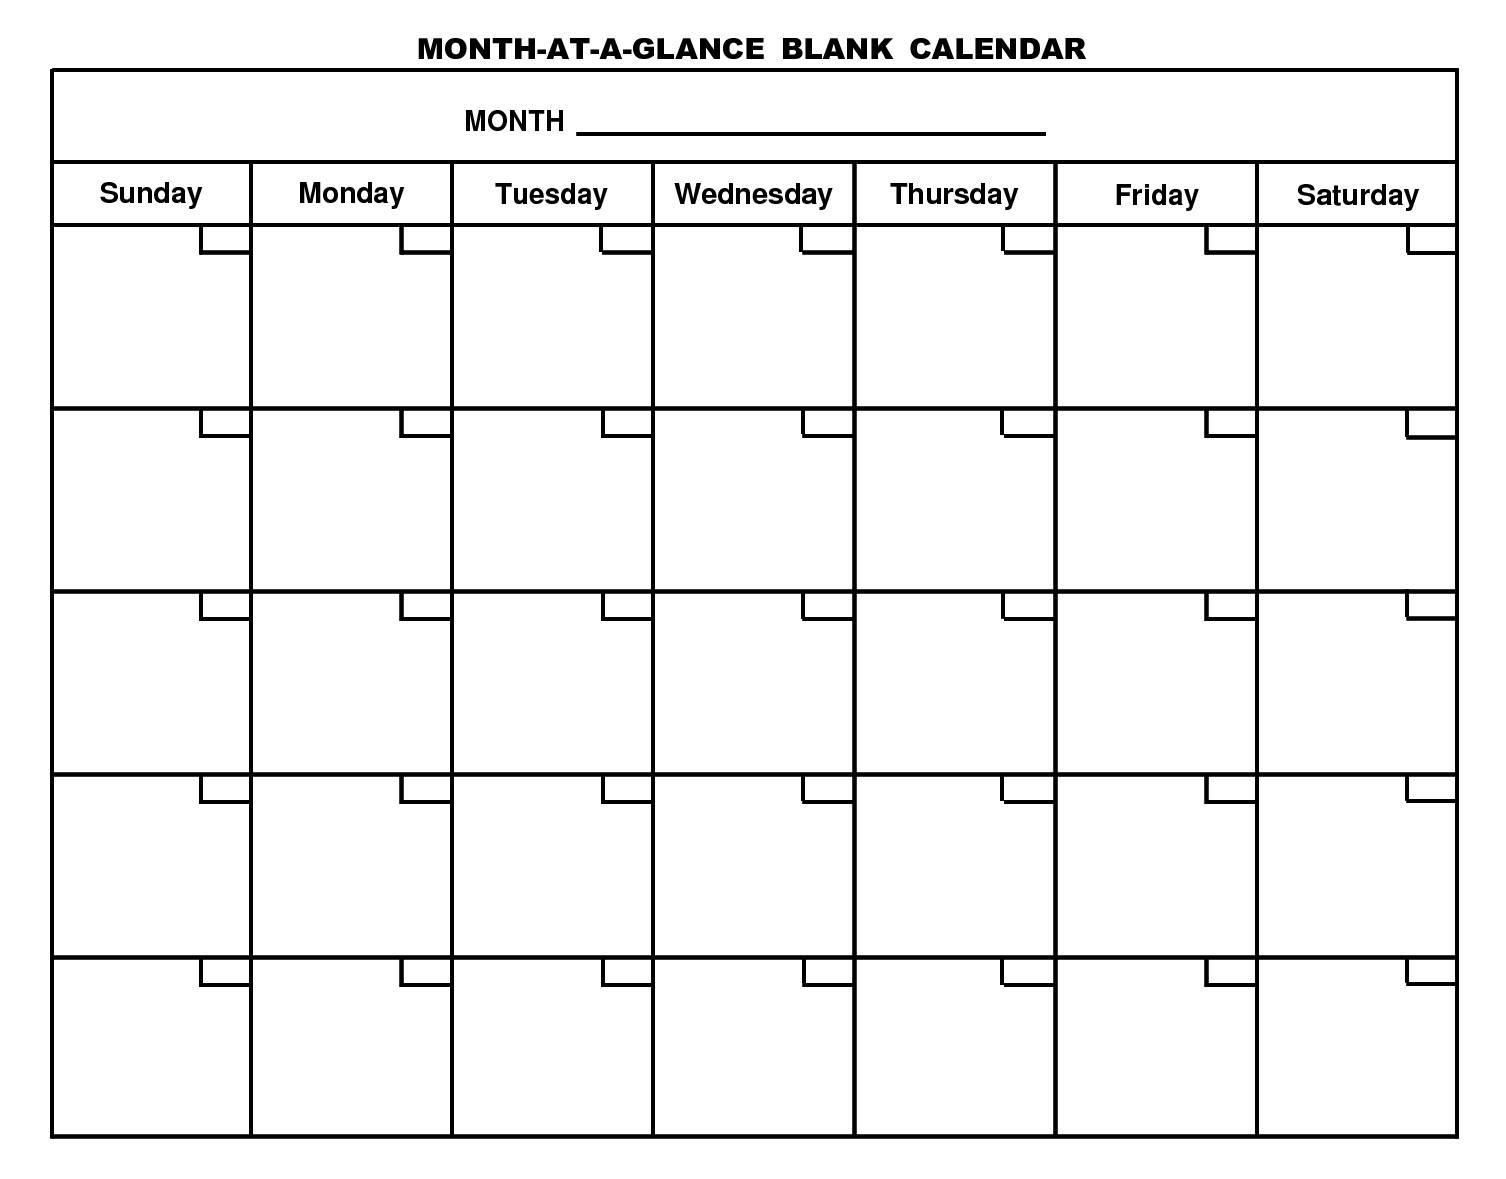 free printable month at a glance blank calendar (1506